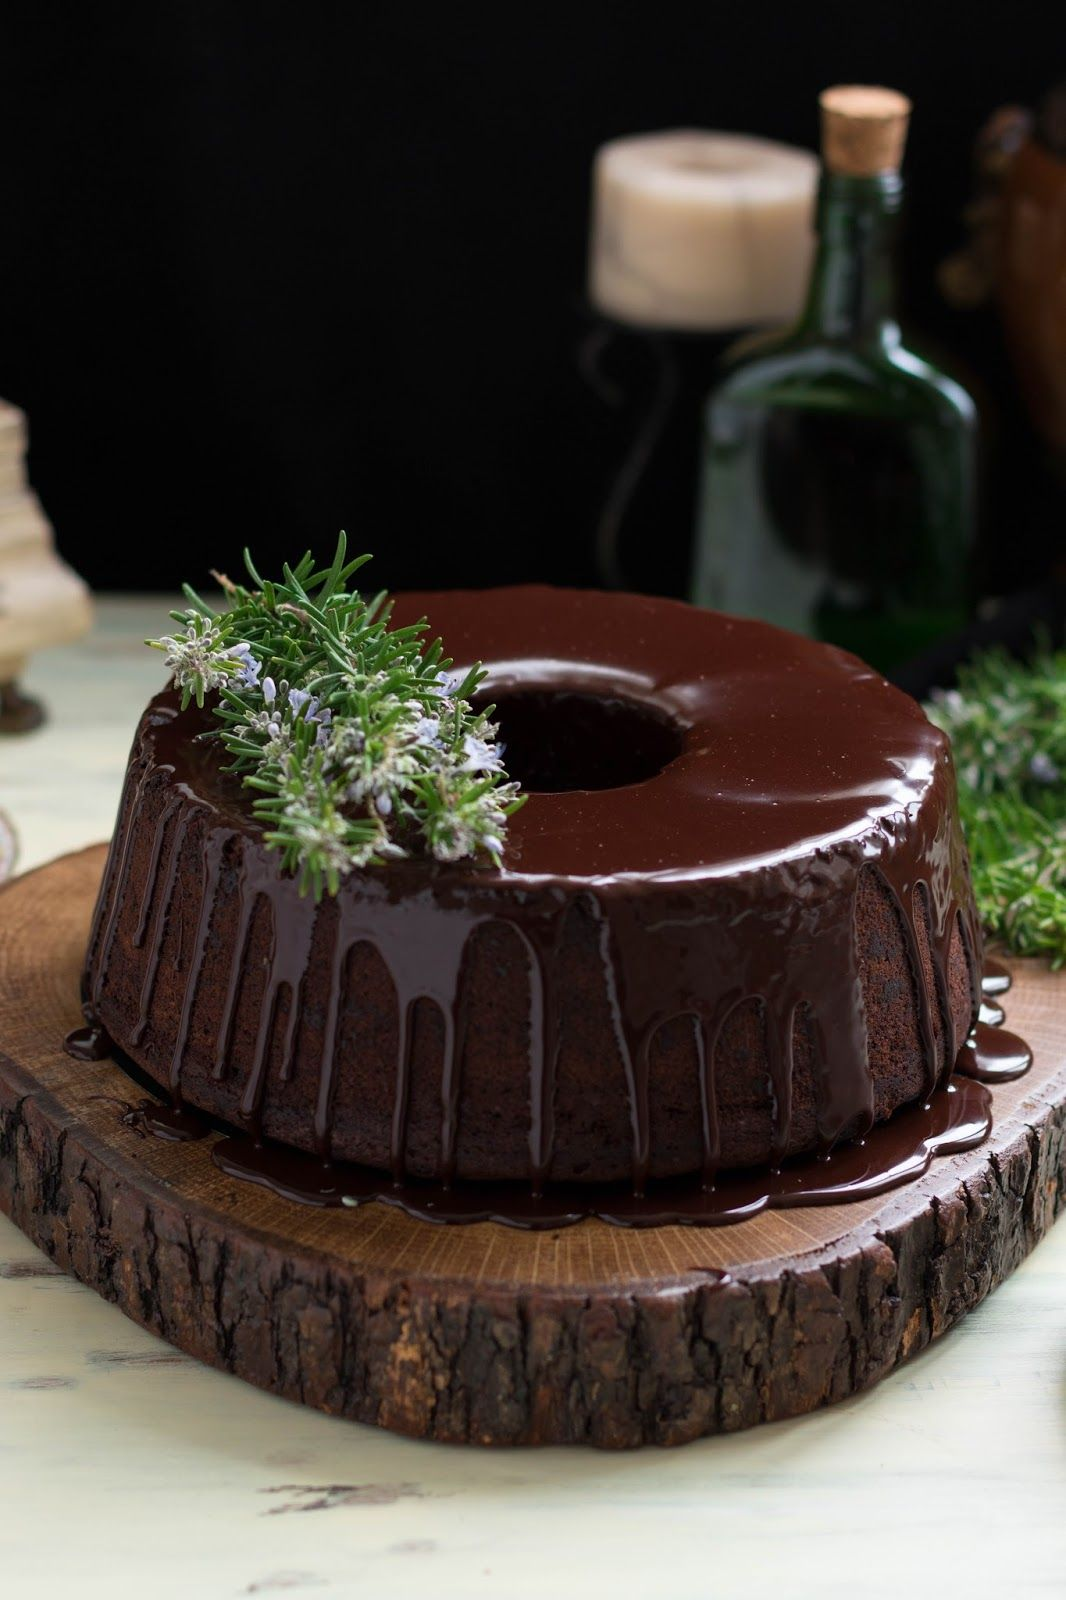 Çikolatalı İsveç Rulosu Tarifi